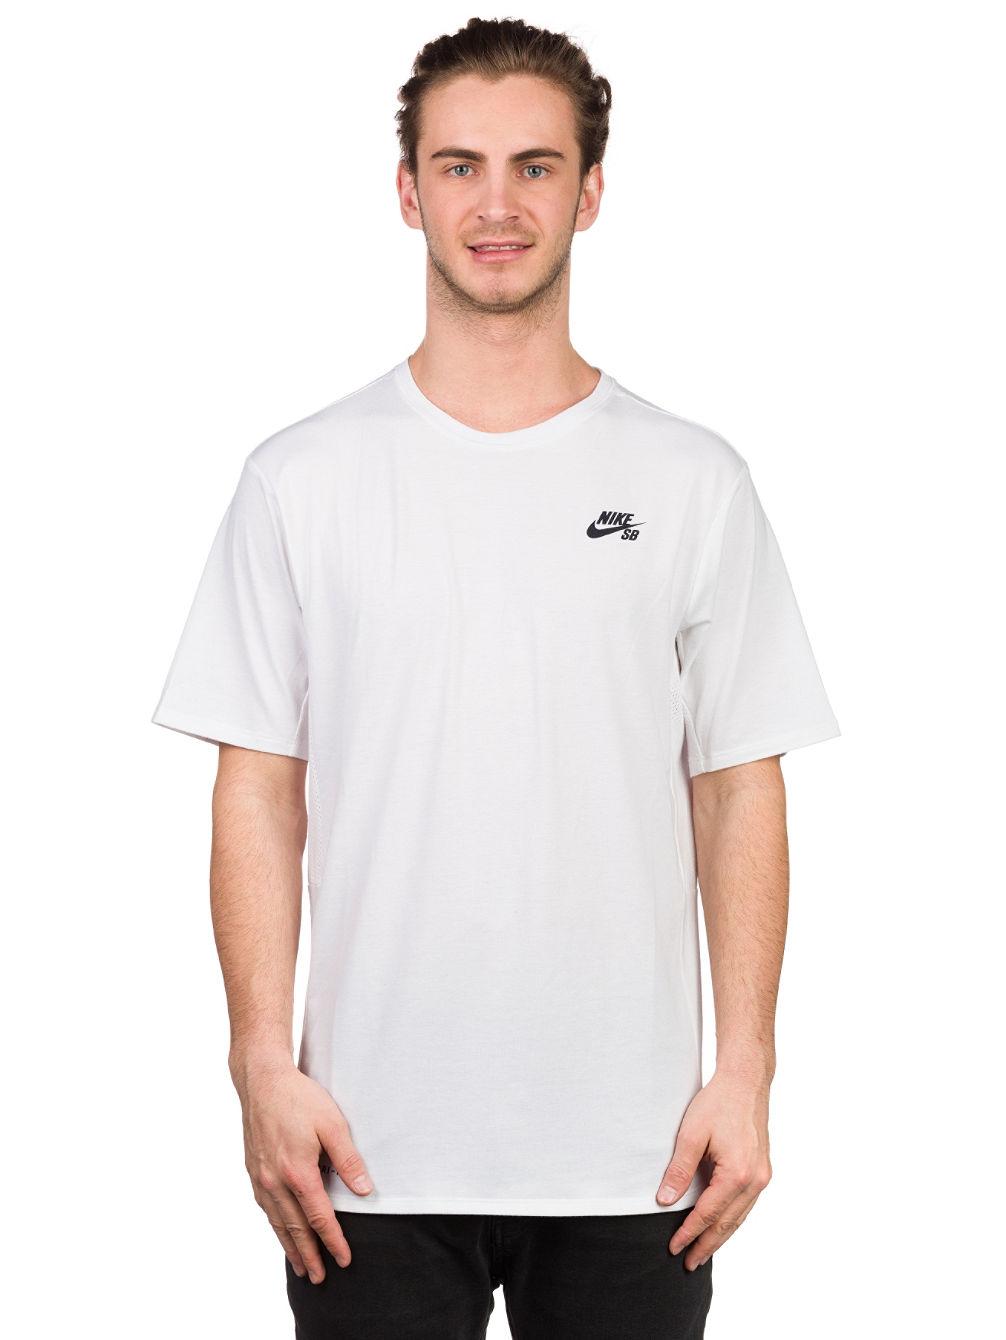 Nike SB Skyline DFC Graphic T-Shirt - nike - blue-tomato.com